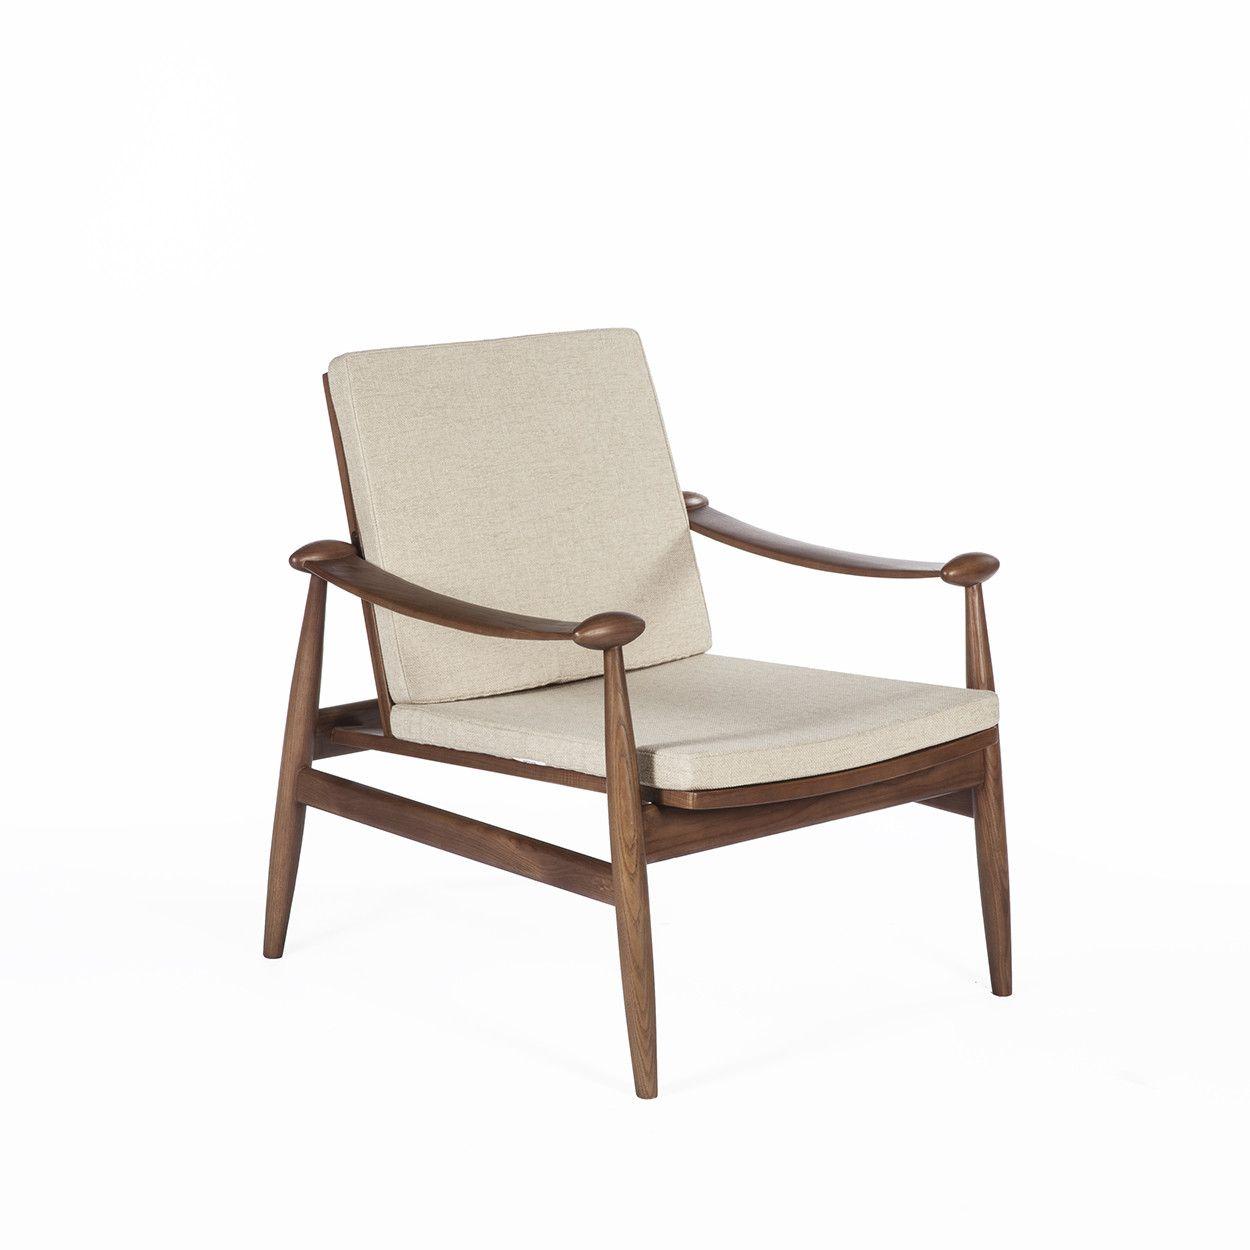 Mid century modern reproduction model 133 spade chair beige inspired by finn juhl